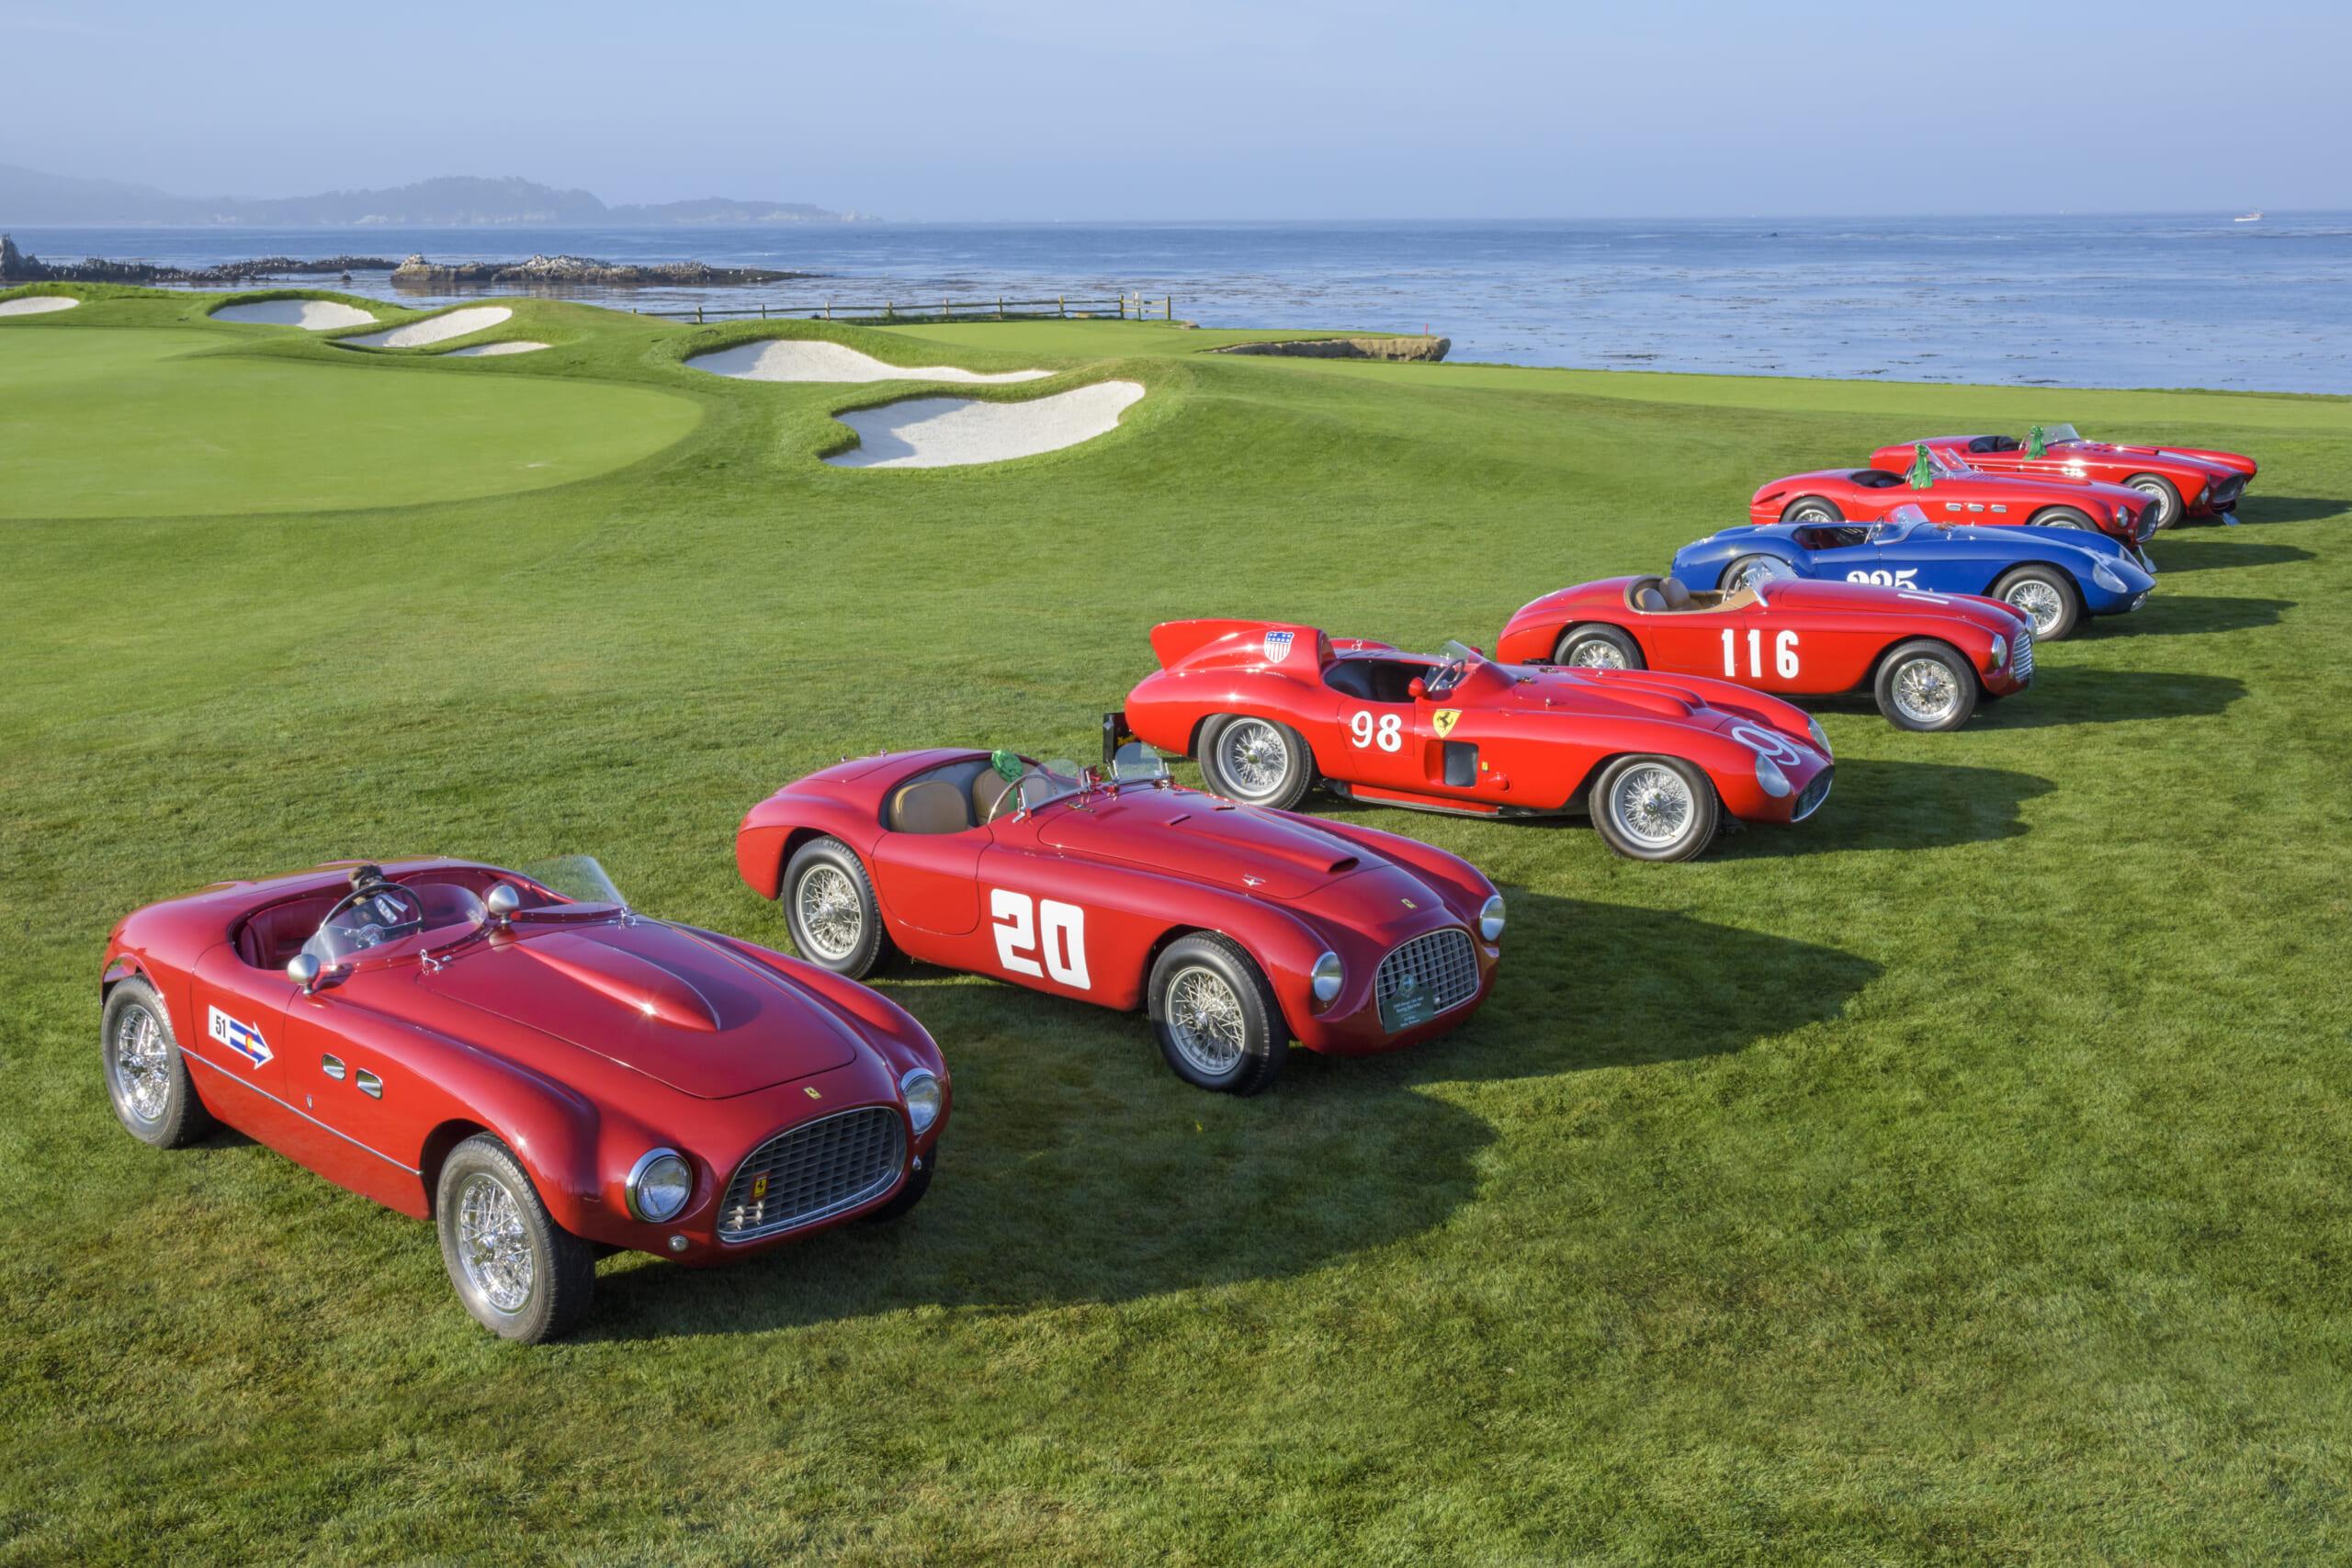 Classic Ferraris - This Ferrari class at Pebble Beach drew a lone blue sheep of the family.